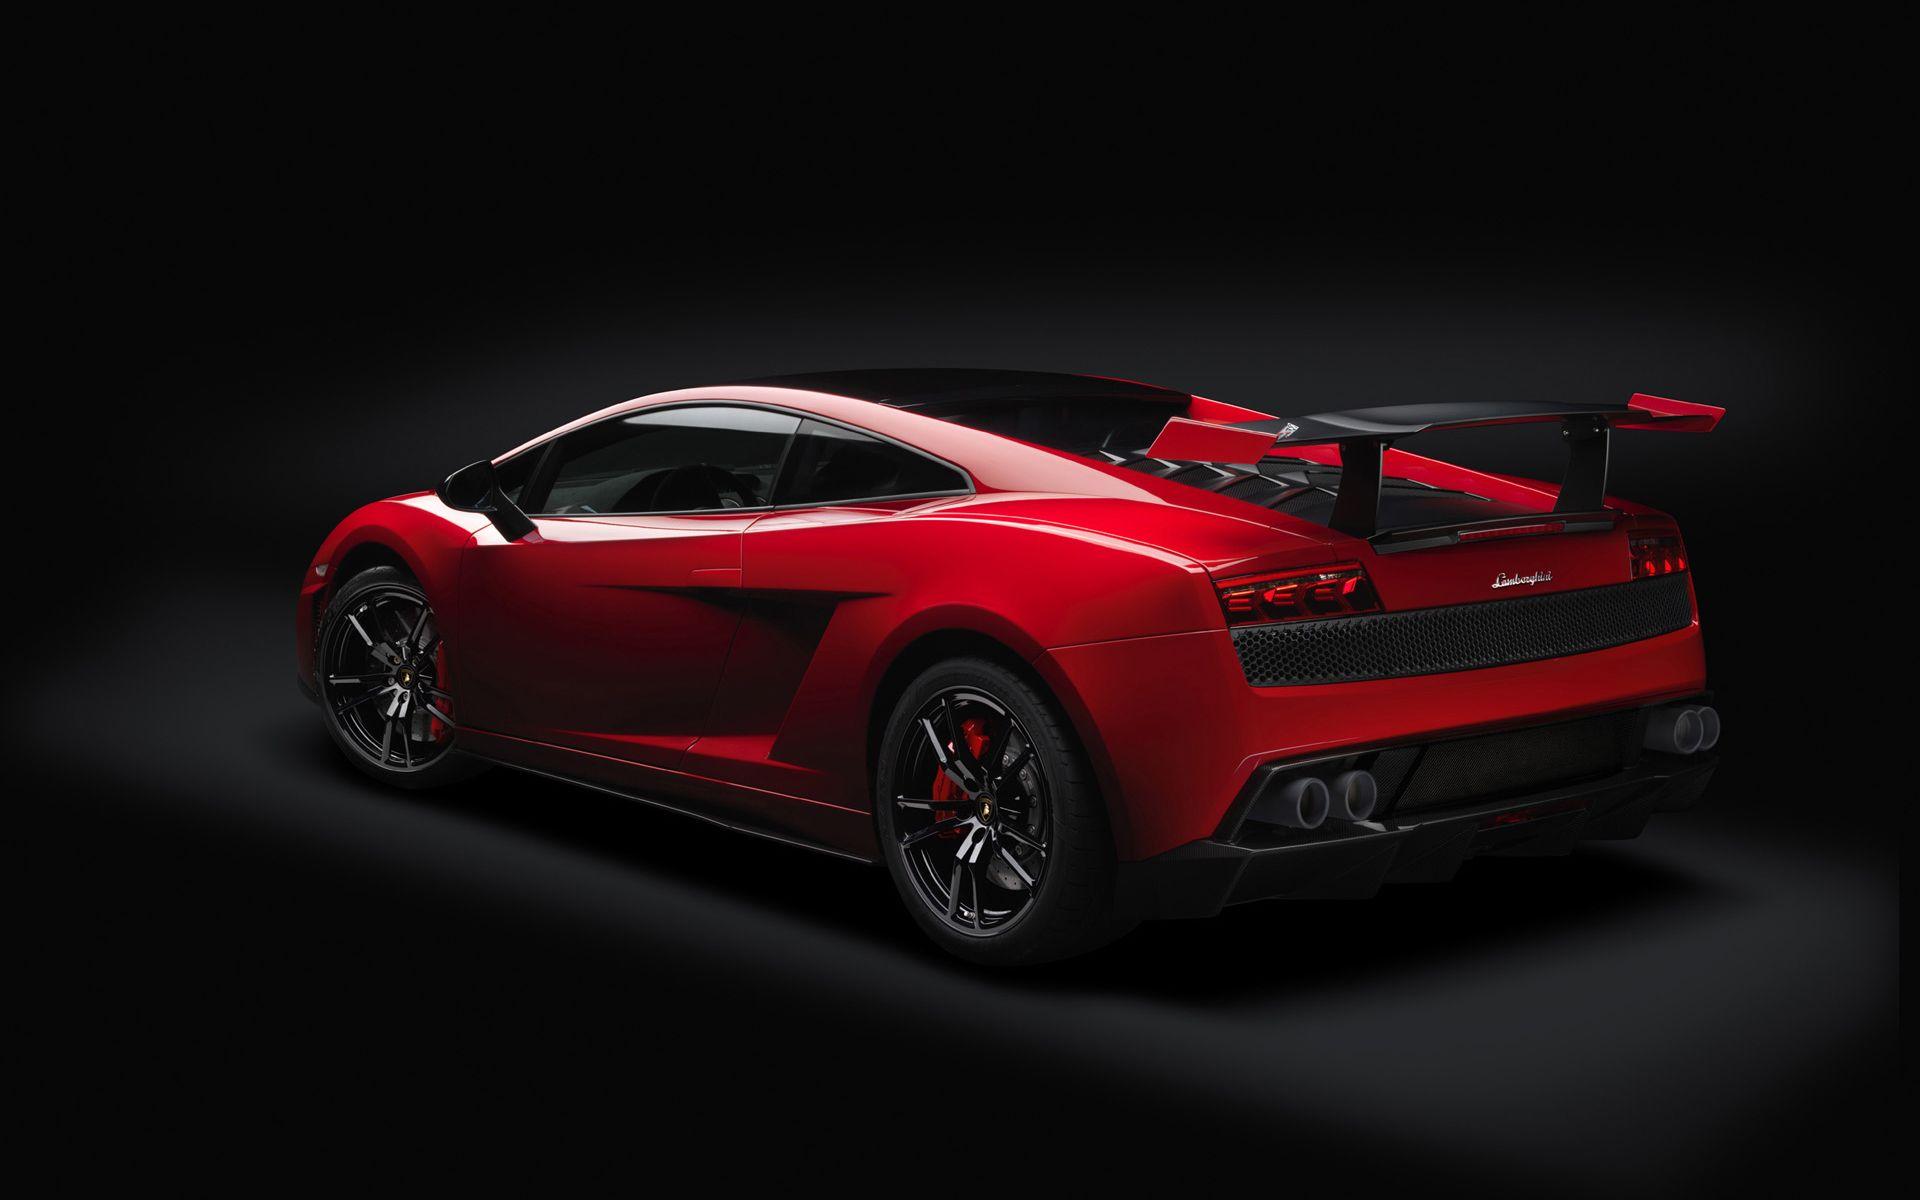 6320245c781cc64116759f84b1739689 Marvelous Photo Ferrari Mondial 8 Quattrovalvole Rouge Occasion Cars Trend